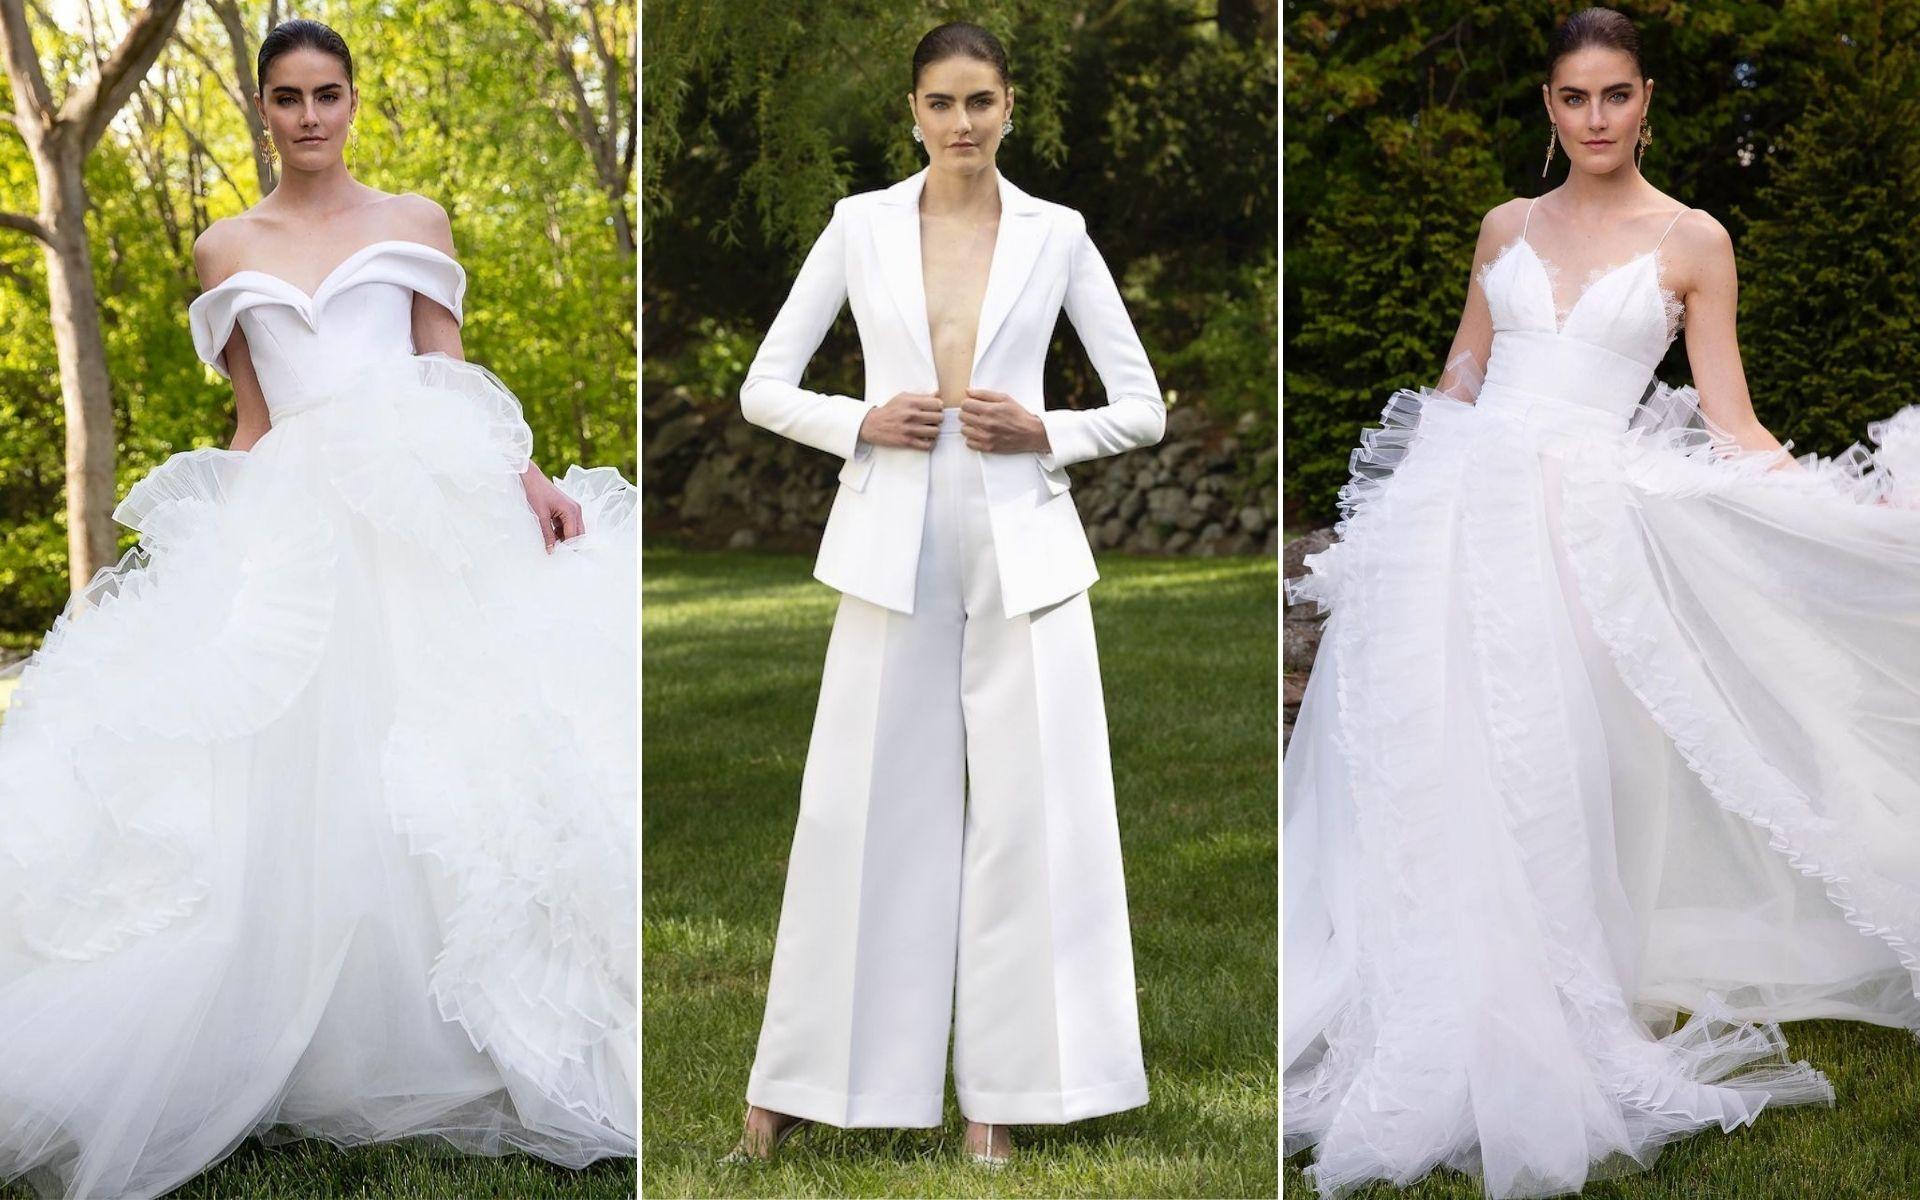 Christian Siriano Bridal Collection 2021/2022